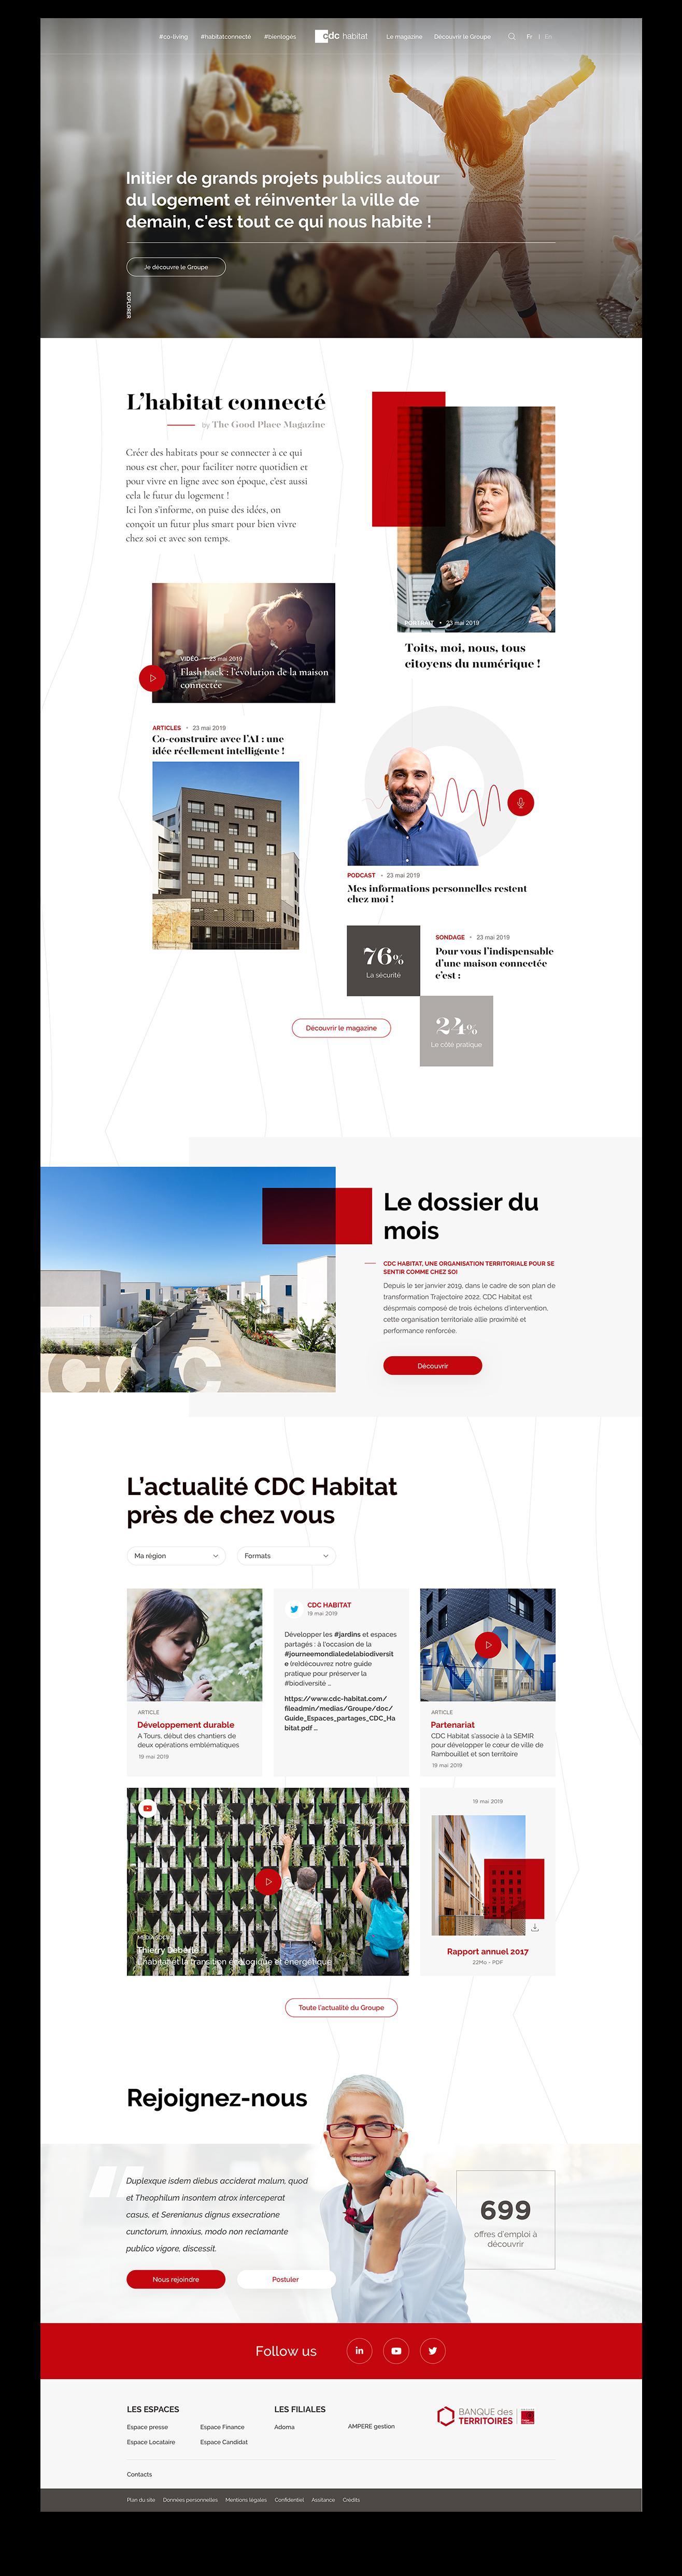 CDC Habitat - Mockup 1